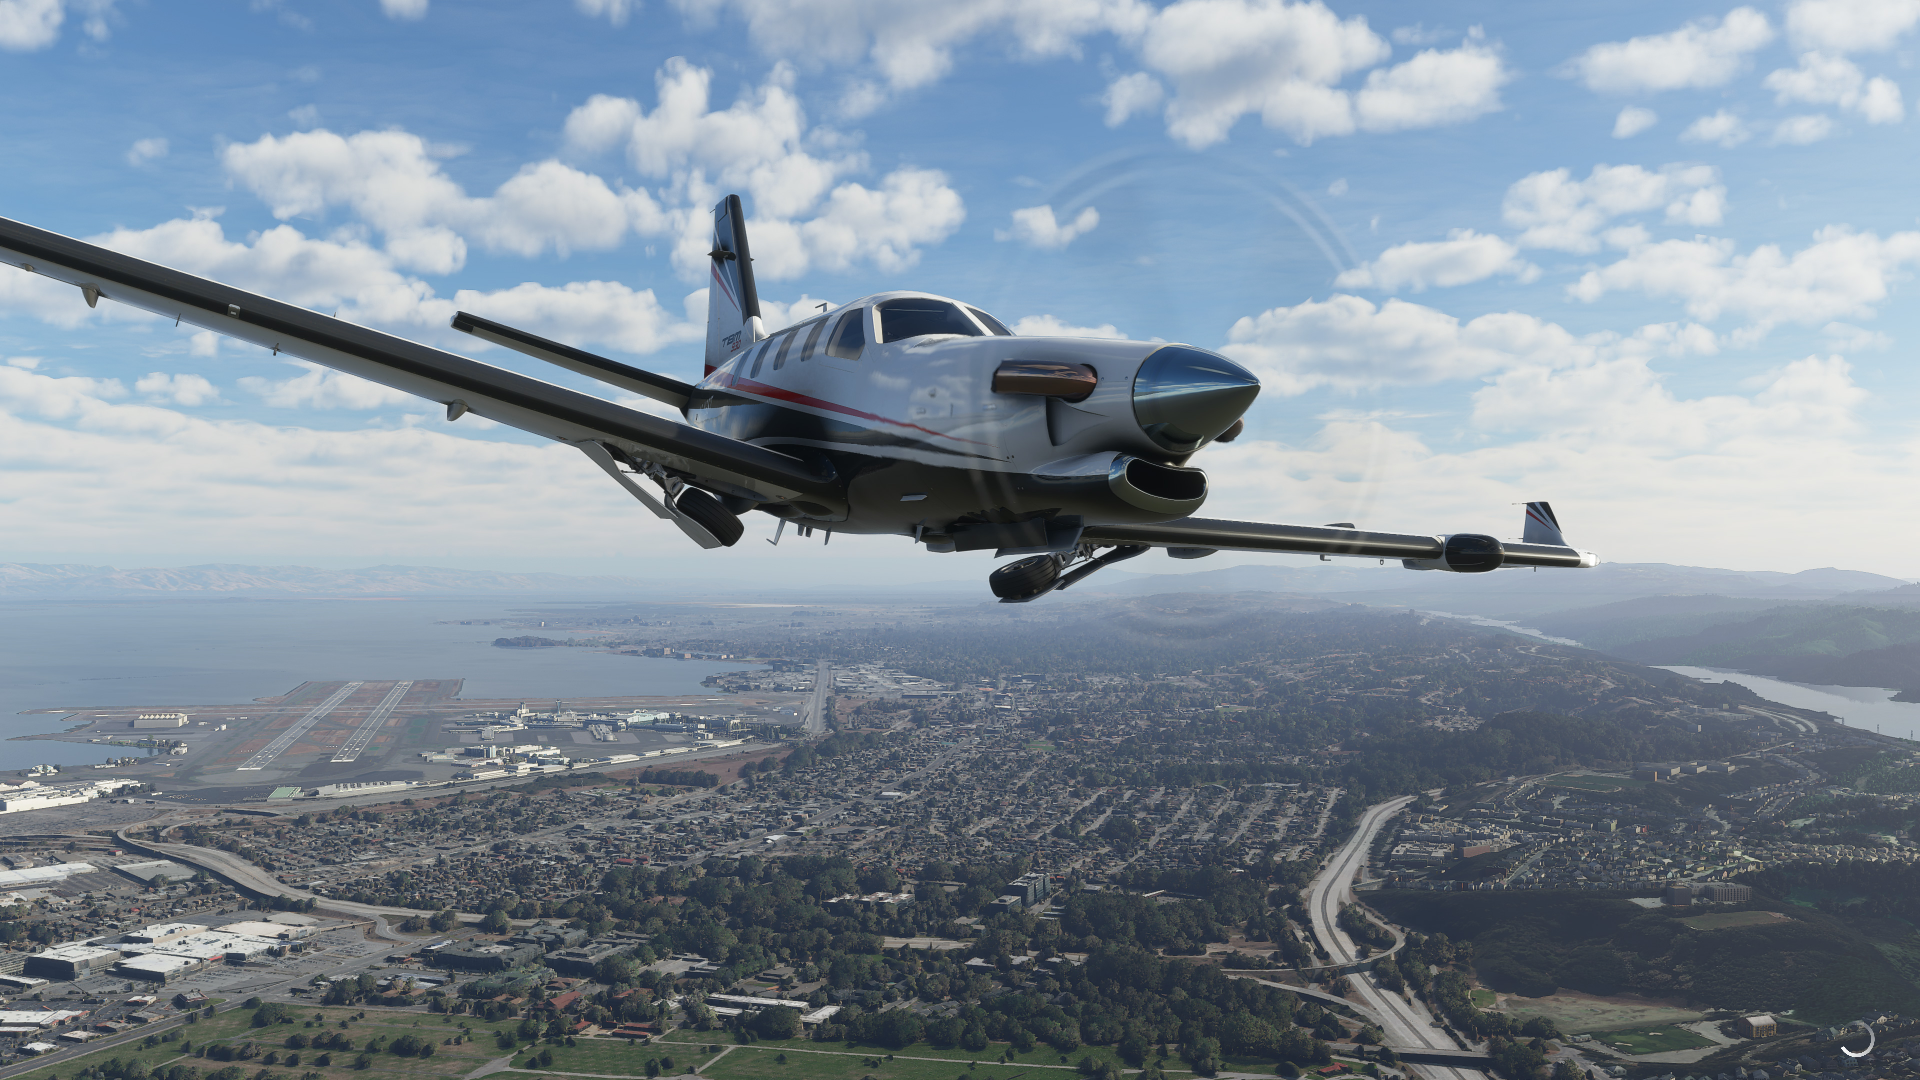 A plane in Microsoft Flight Simulator